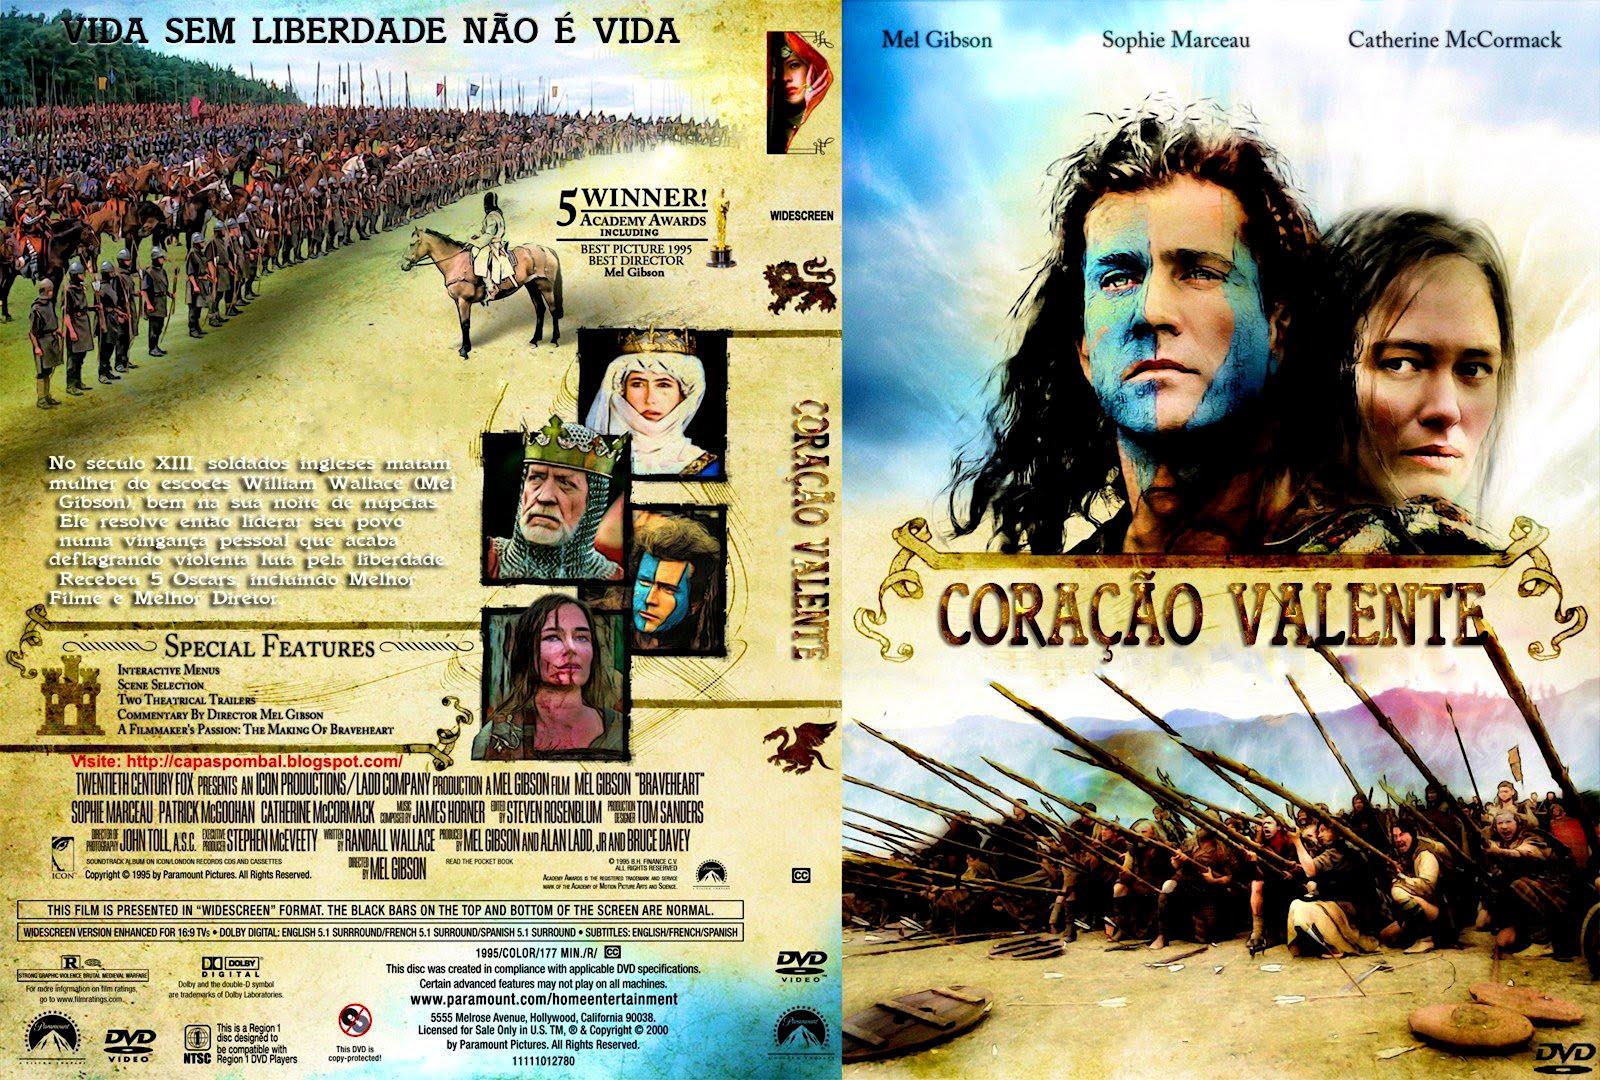 Coracao Valente Dvd Cover